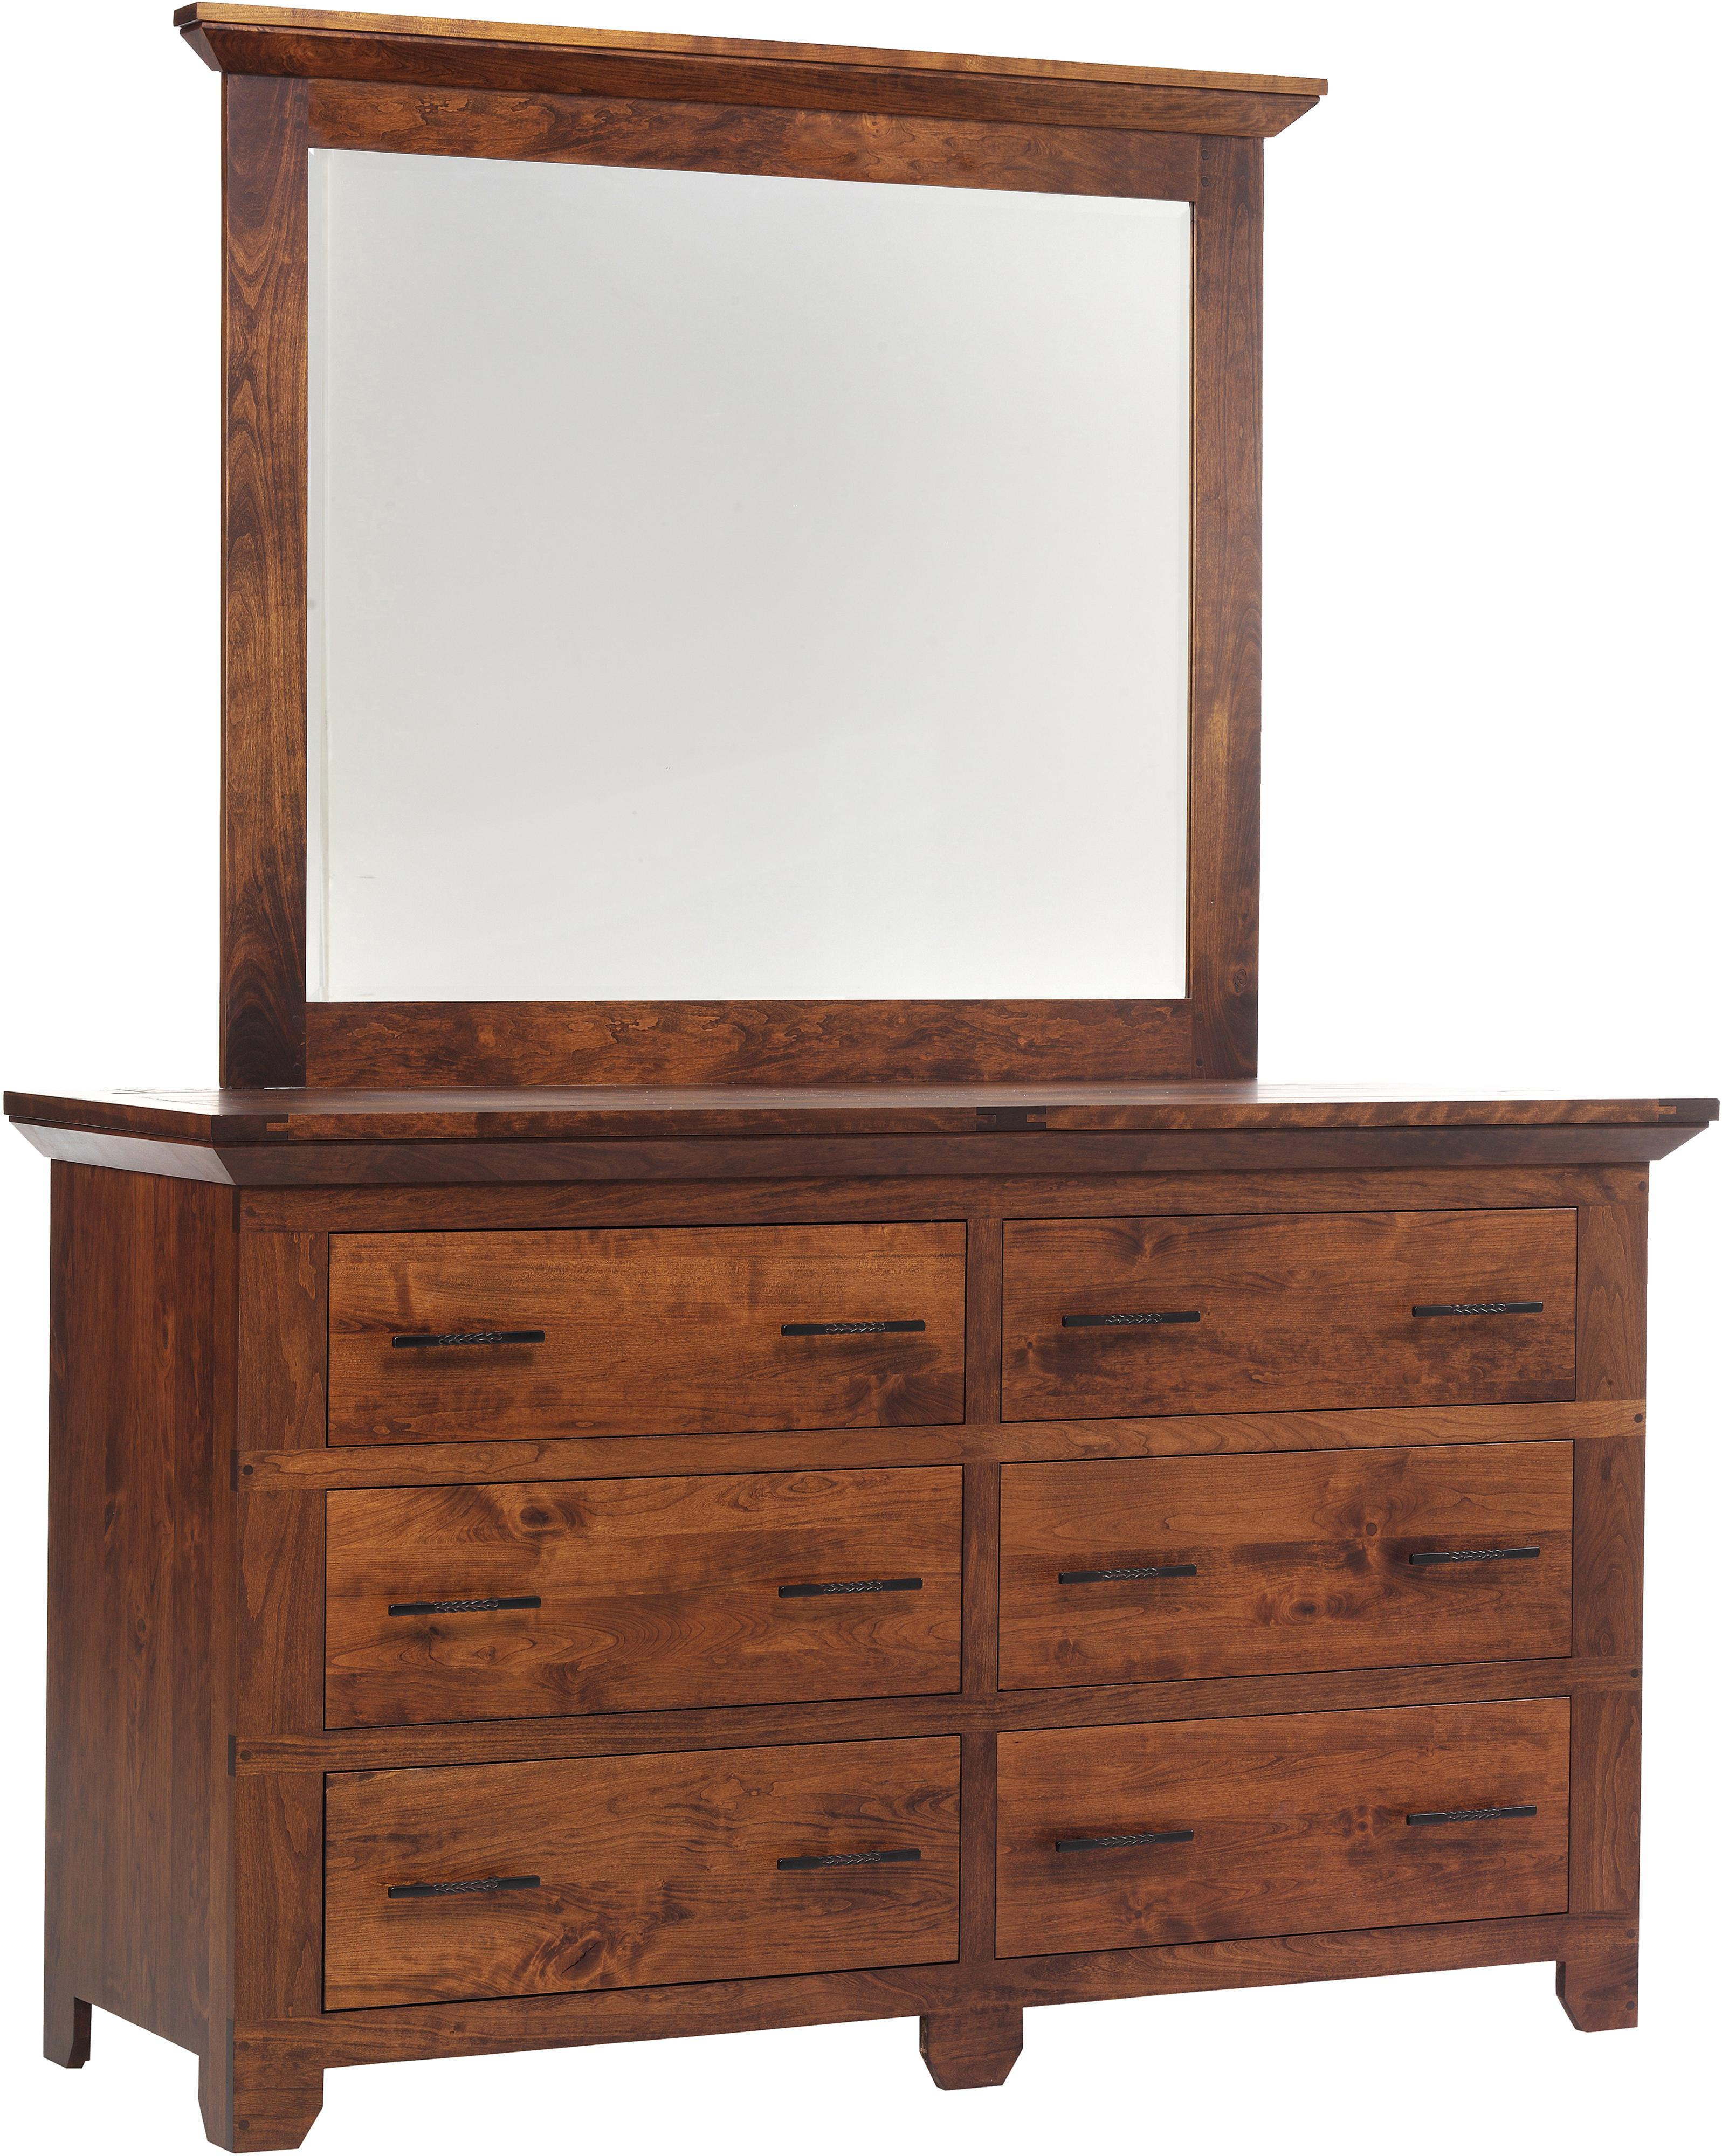 Redmond Wellington Dresser and Mirror Set by Millcraft at Saugerties Furniture Mart